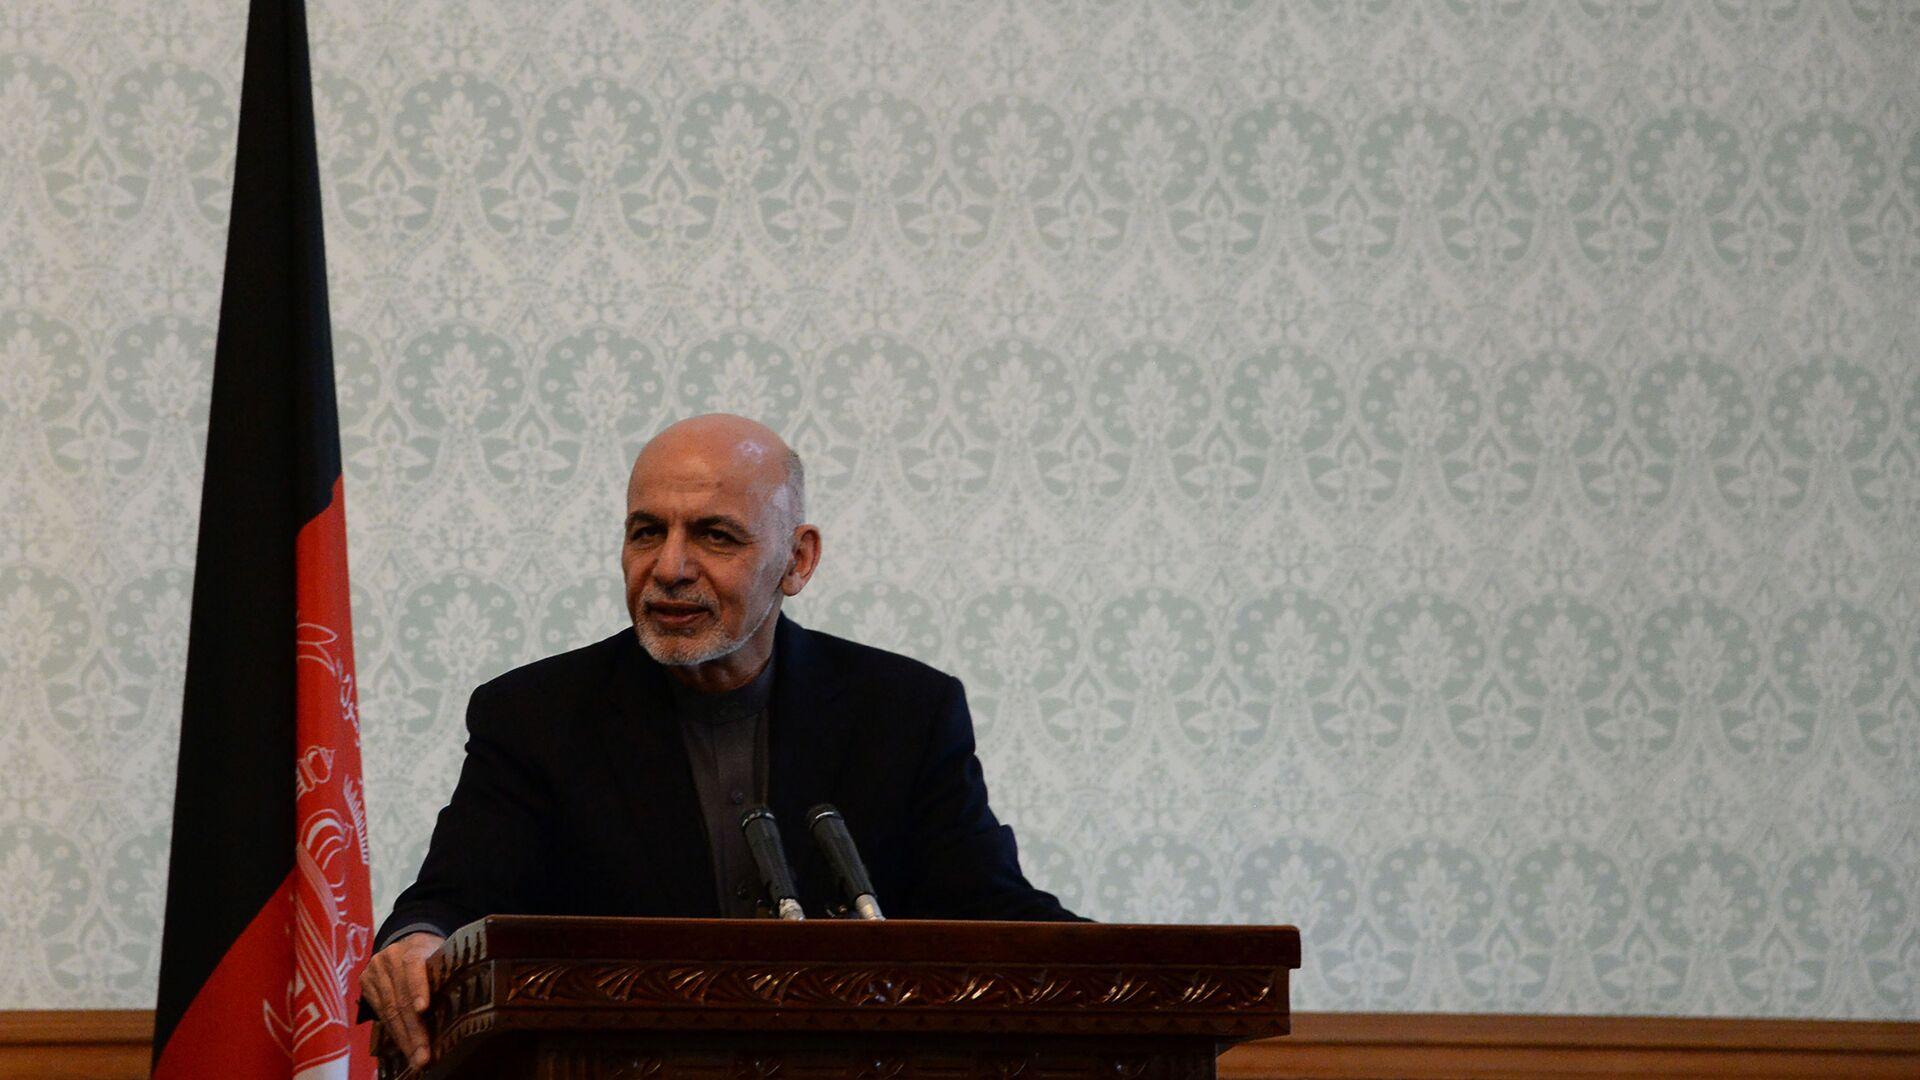 Presidente dell'Afghanistan Ashraf Ghani - Sputnik Italia, 1920, 15.08.2021